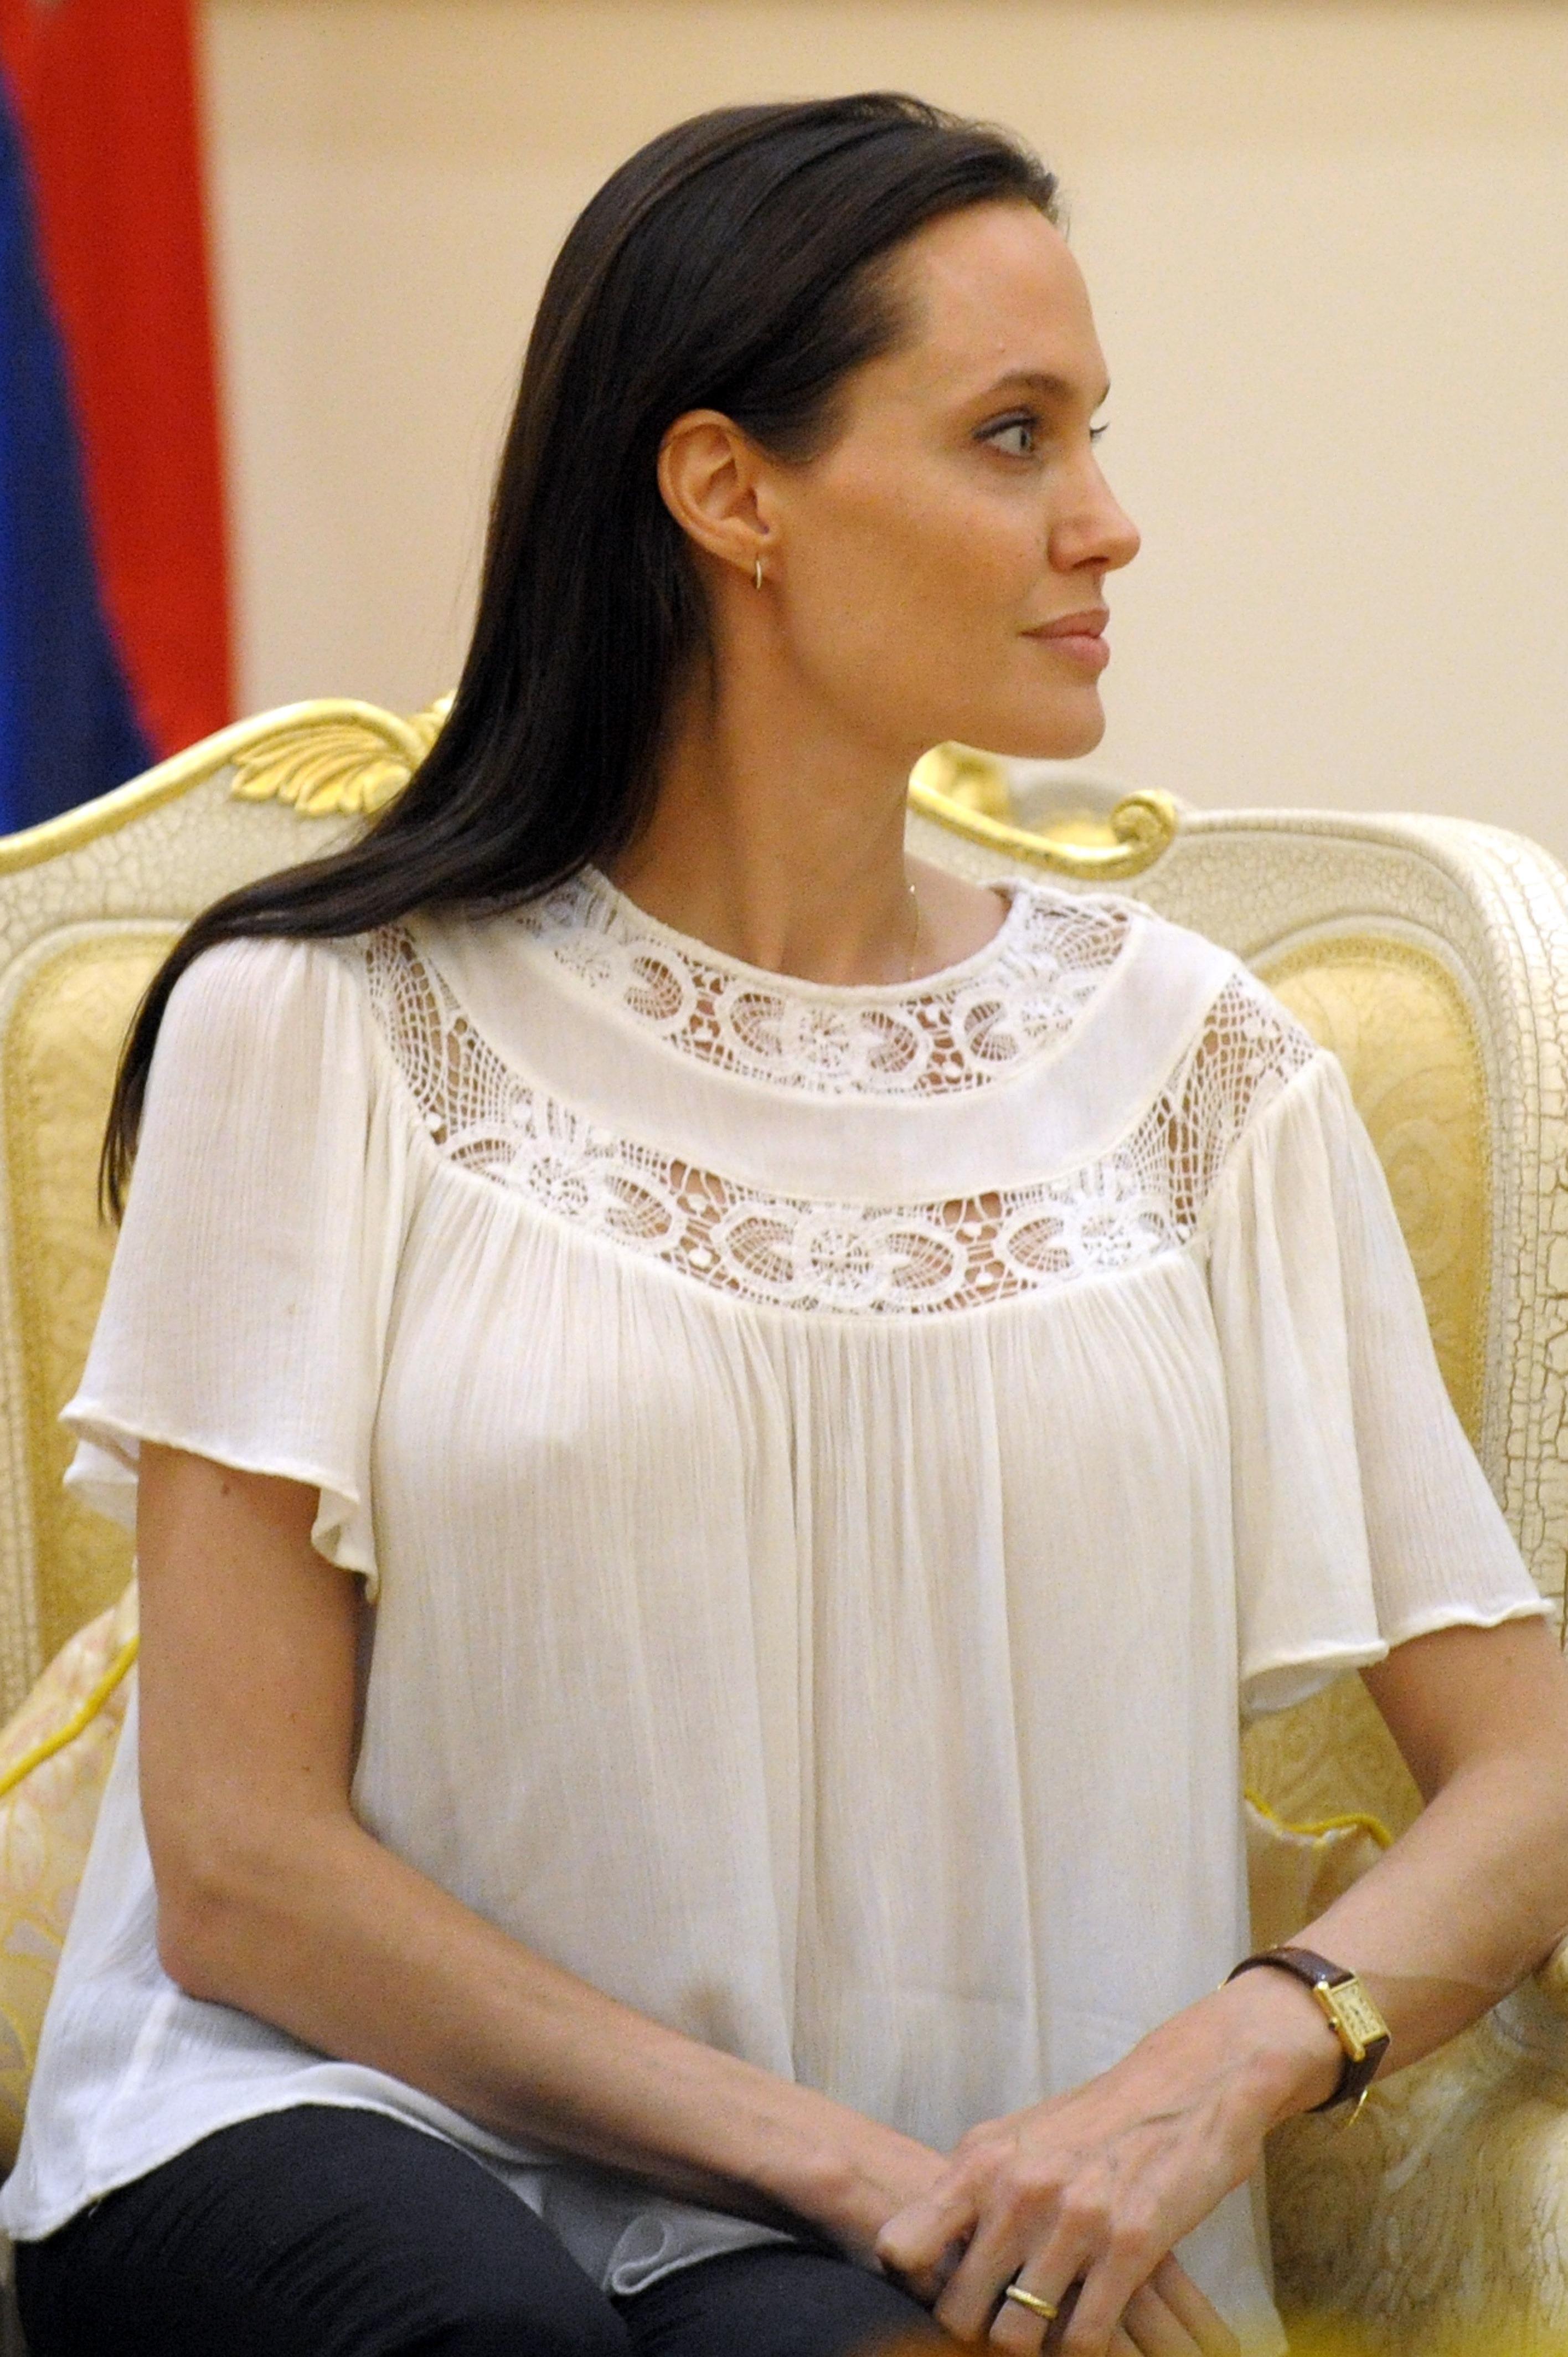 Nem tudja leplezni soványságát Angelina Jolie